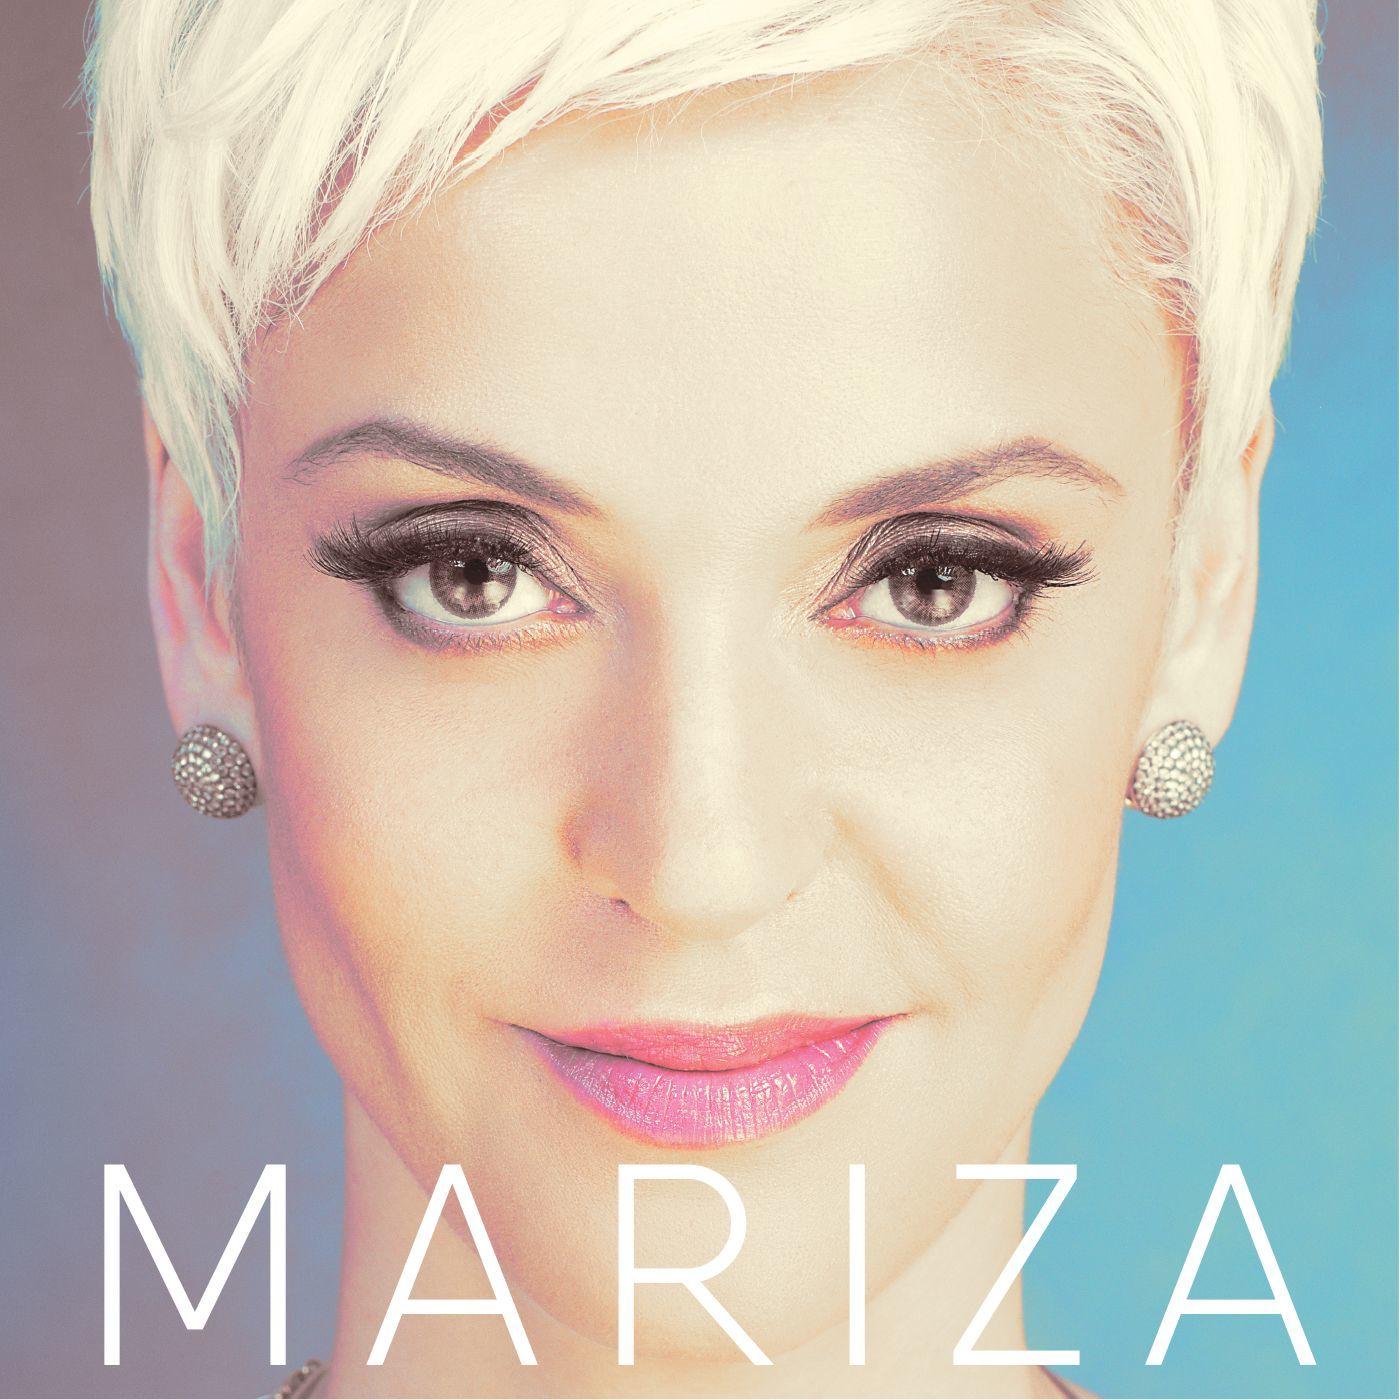 cover-mariza-mariza-2018-world-music.jpg